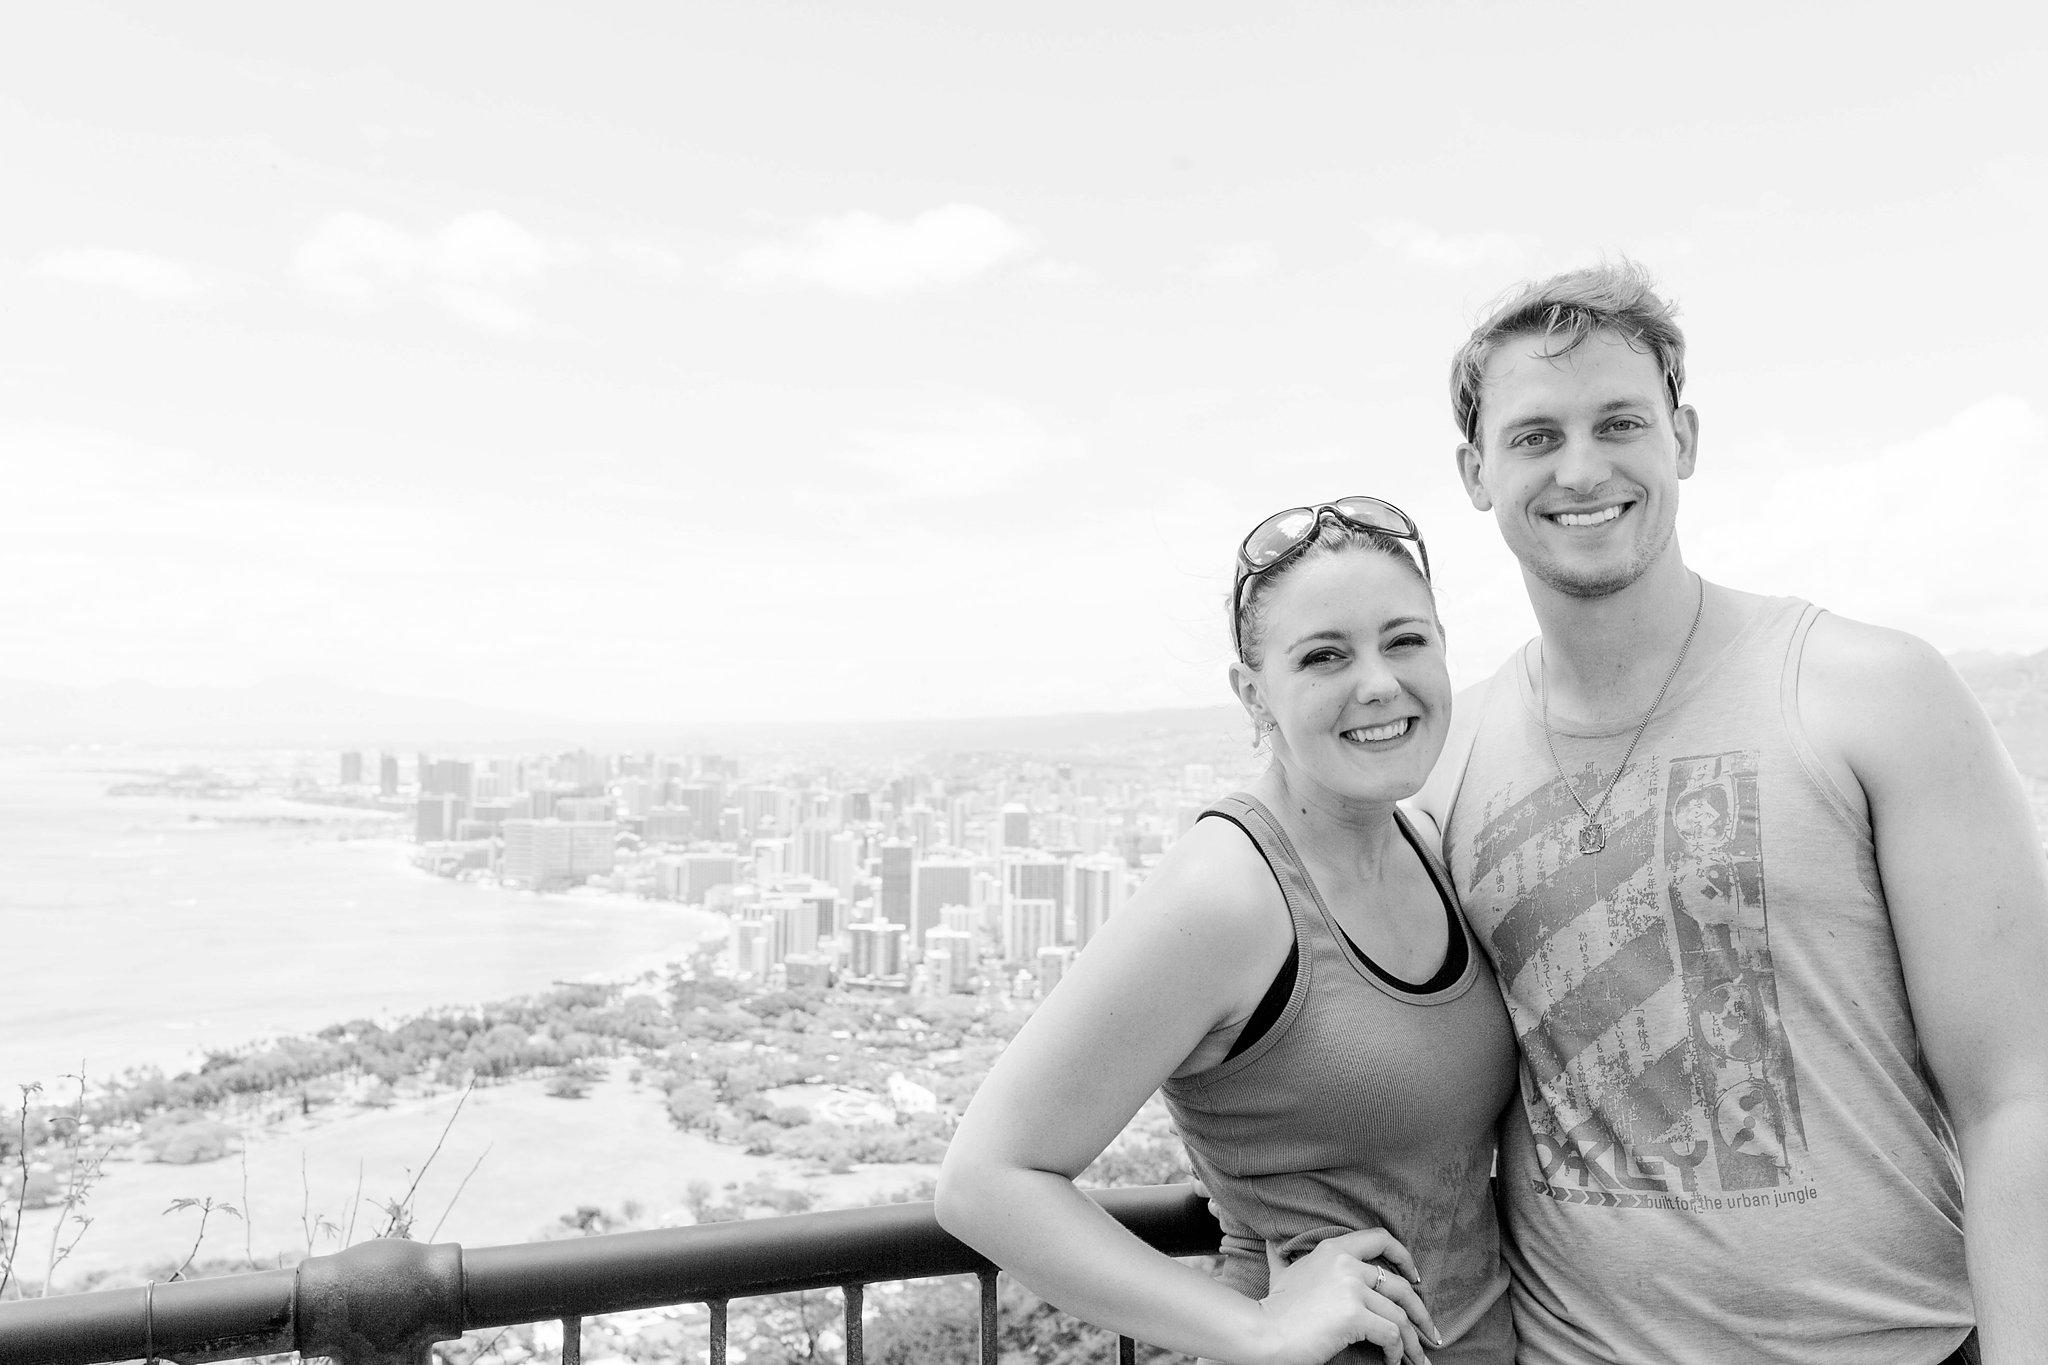 Hawaii Honeymoon Photos Megan & Justin Oahu Vacation Things To Do--41.jpg